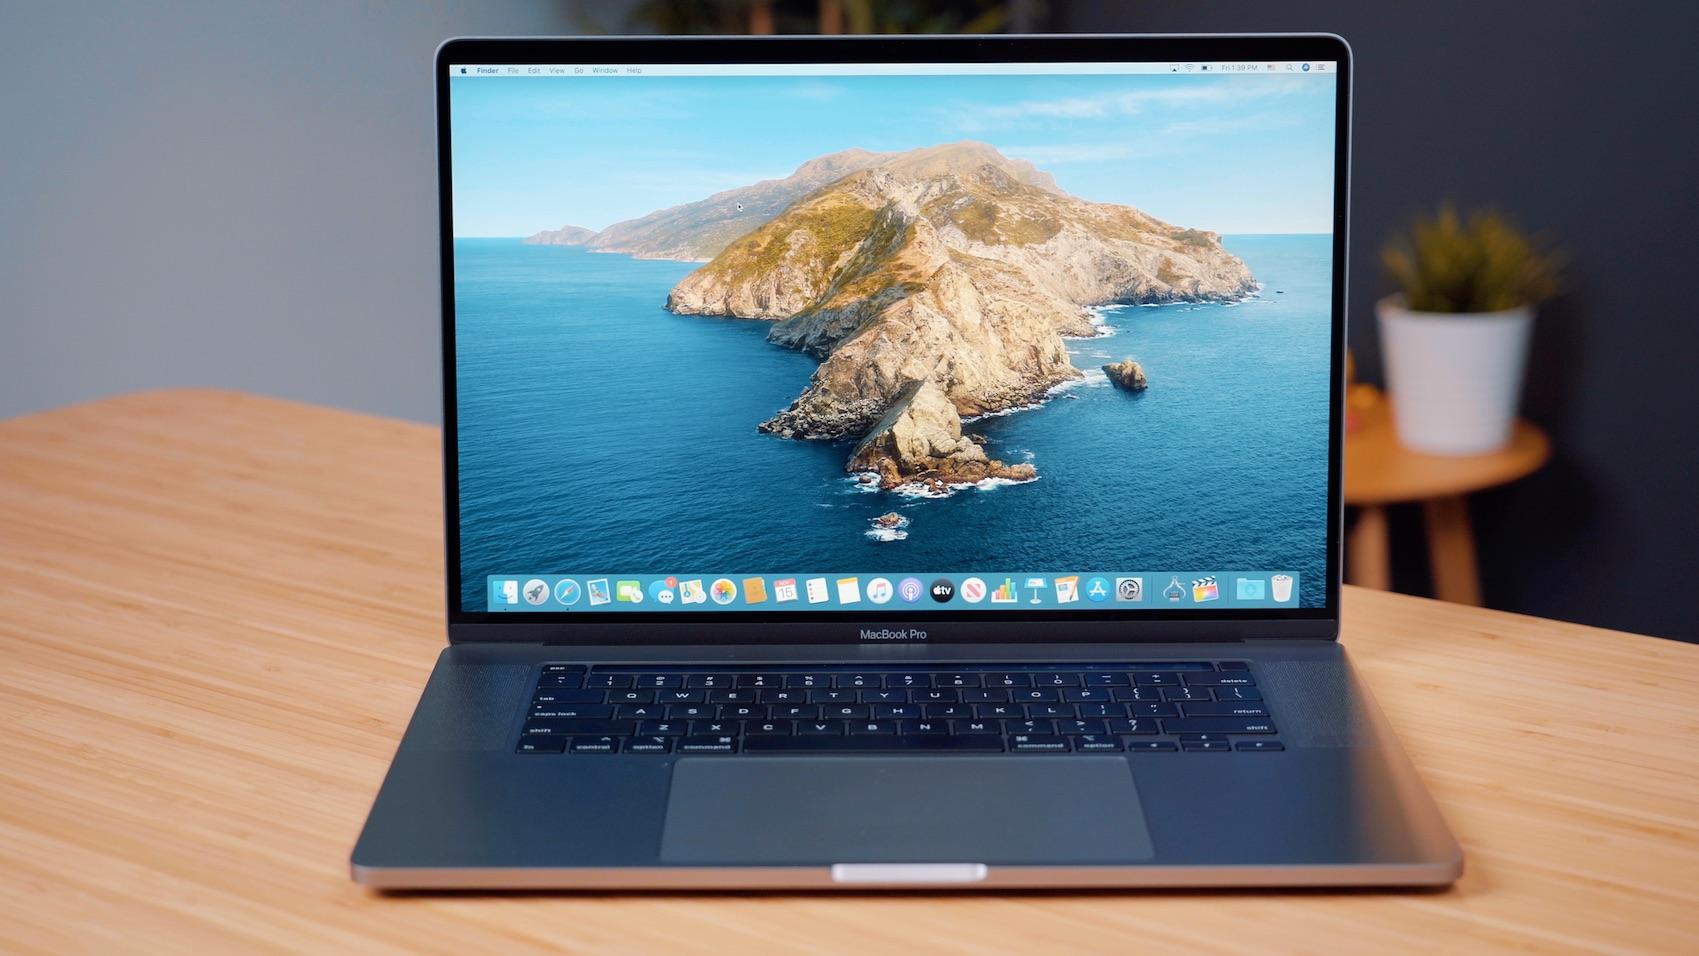 Top Stories: 16-Inch MacBook Pro Debuts, Mac Pro in December, AR Headset Rumors, and More